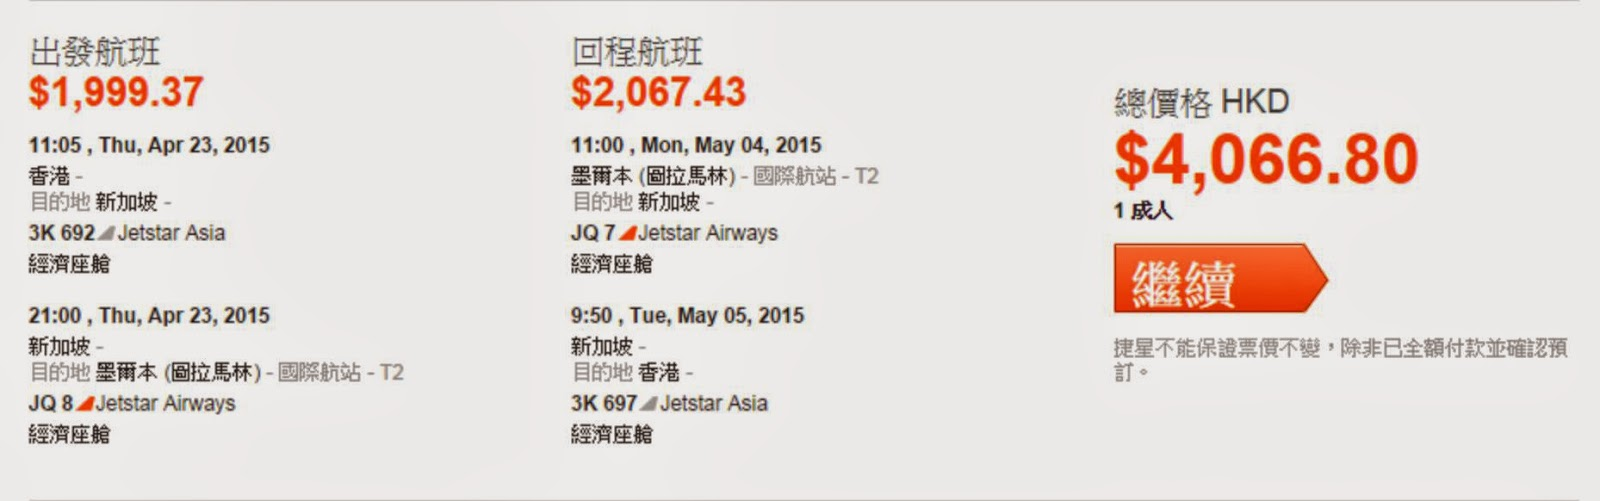 jerstar捷星航空,香港去墨爾本 單程HK$1,616起(來回連稅HK$4,067起)